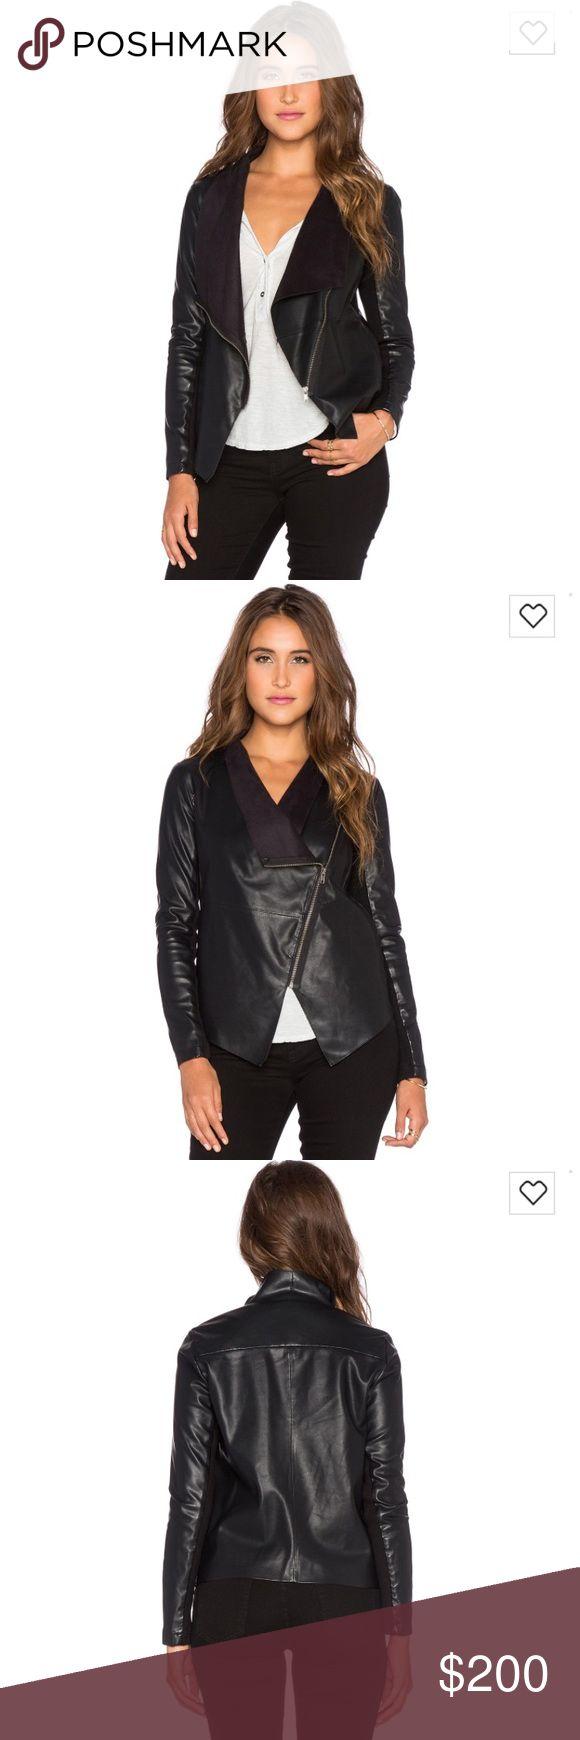 "BB Dakota ""Bradford"" Jacket Polyurethane blend, zip front closure, side seam pockets, rib knit sleeve panels. Brand new condition. BB Dakota Jackets & Coats"